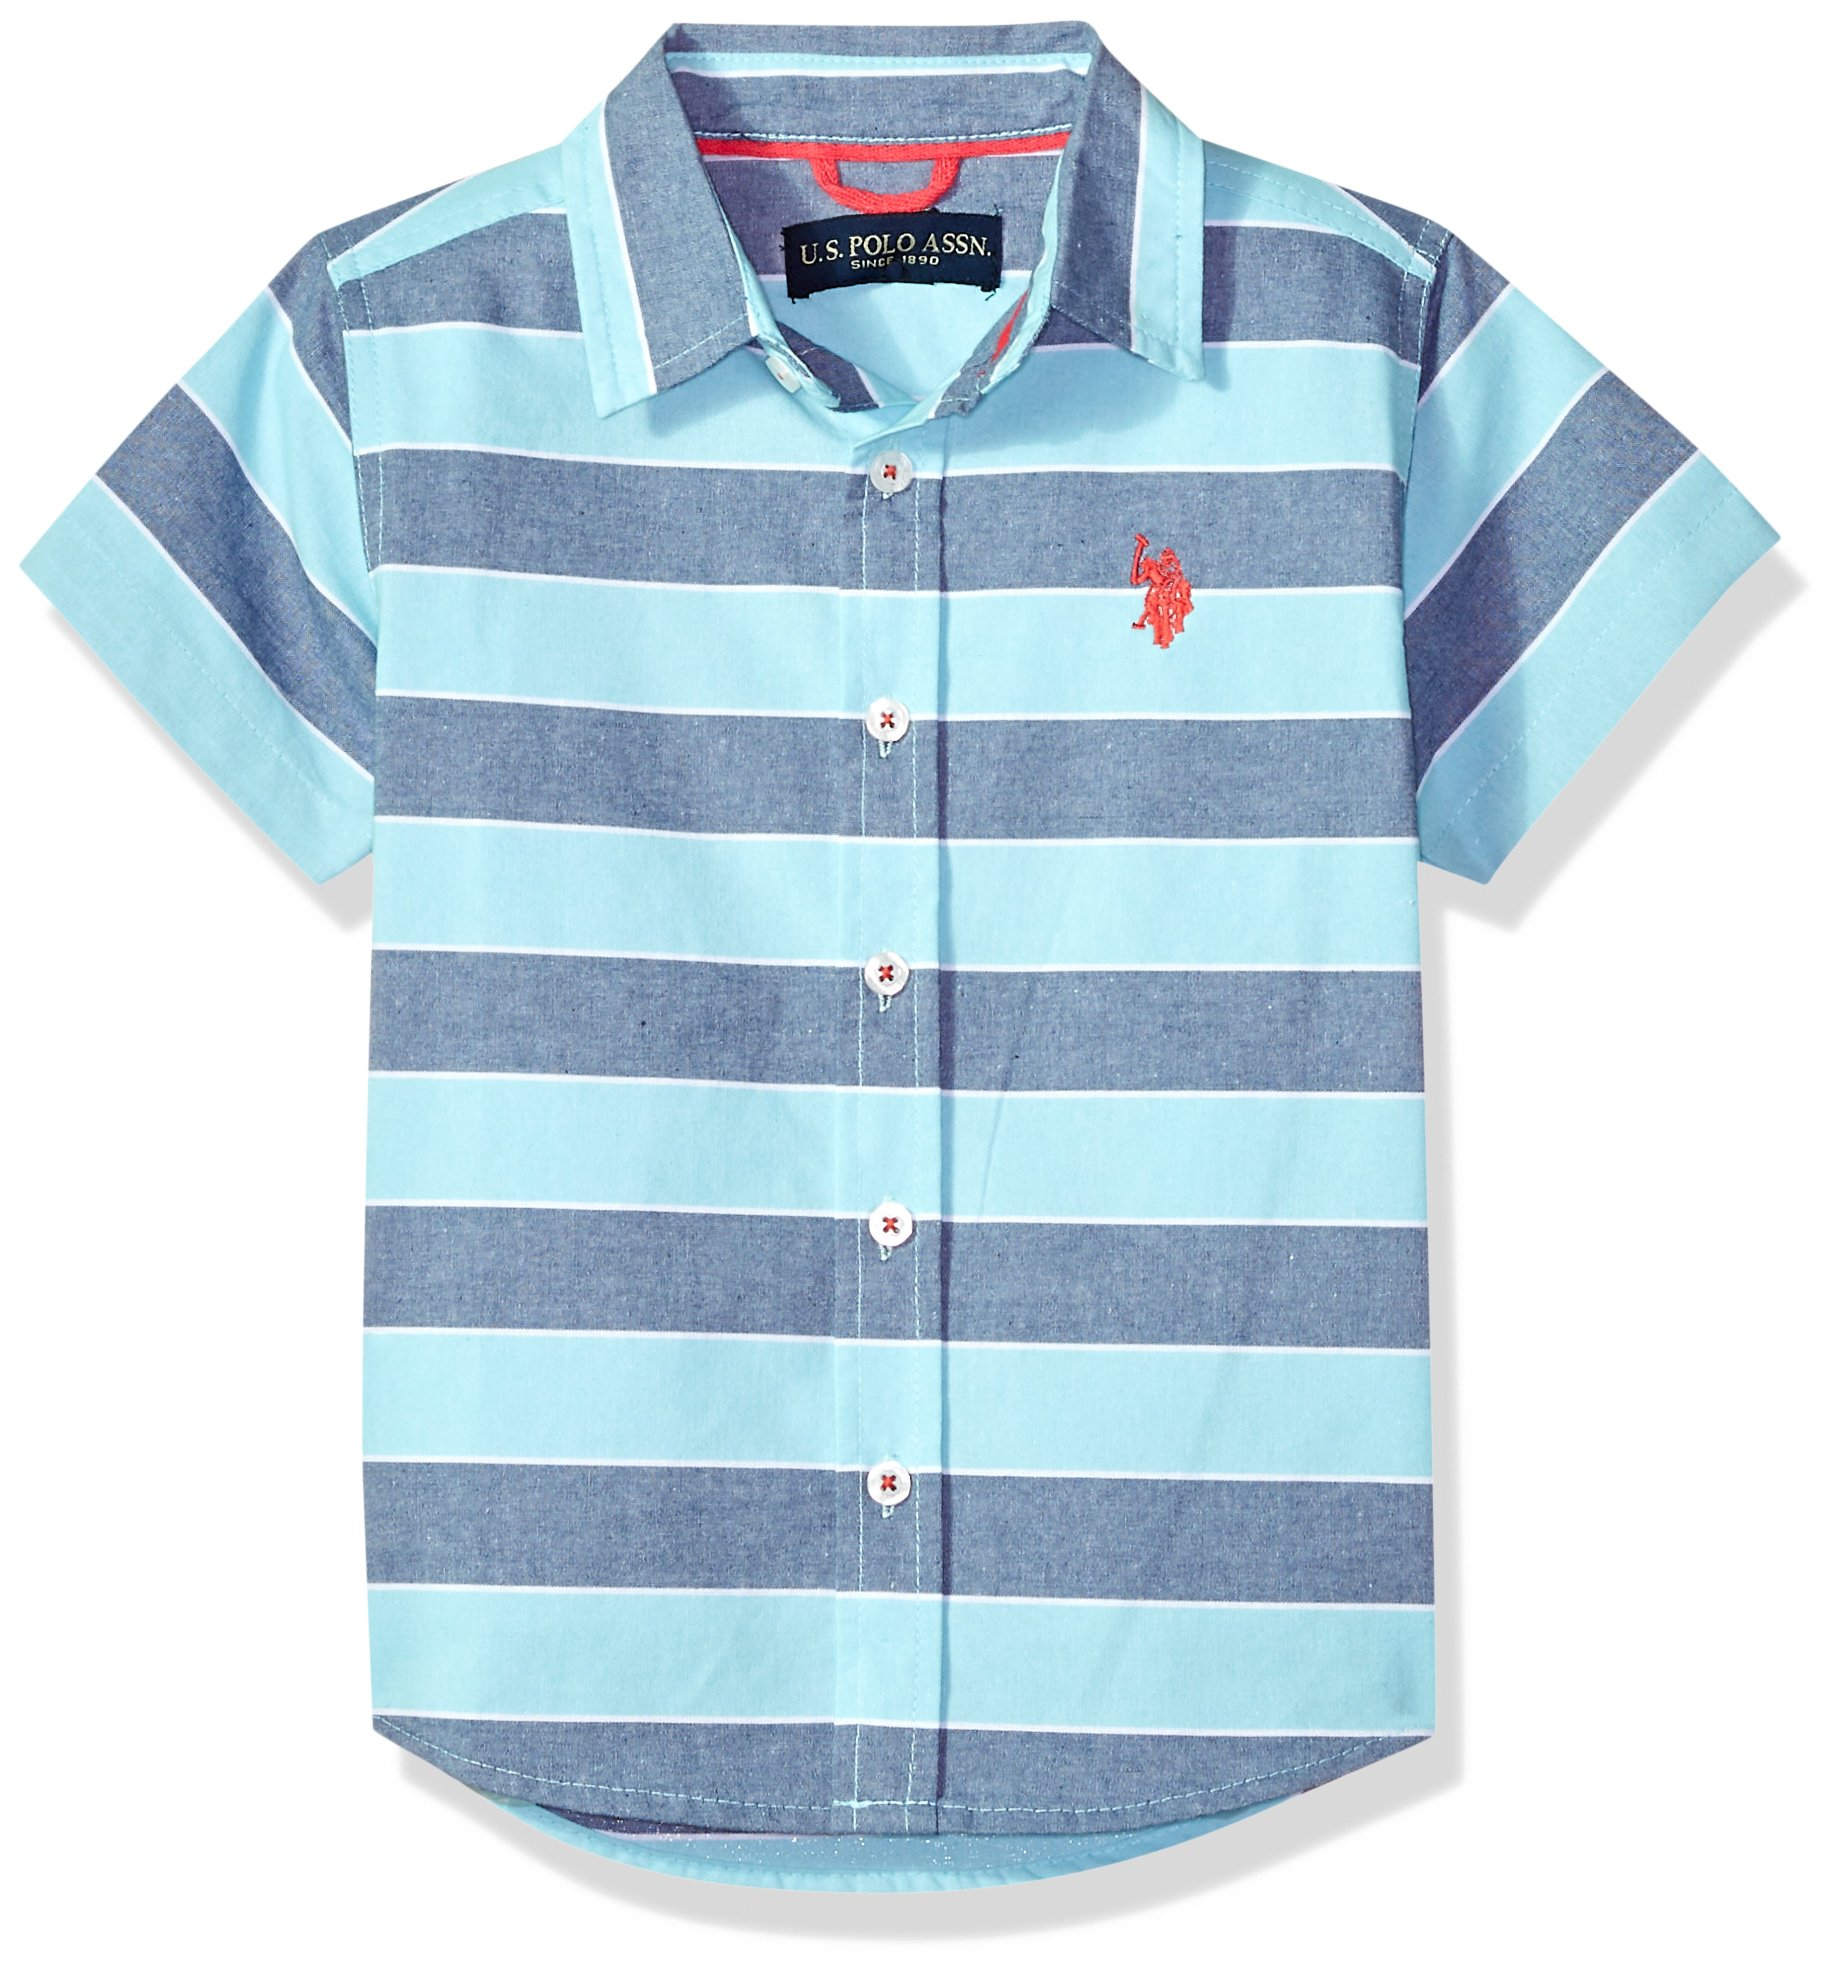 U.S. Polo Assn. Boys Short Sleeve Striped Sport Shirt, Grosgrain Locker Loop Collar Painters Aqua 14/16